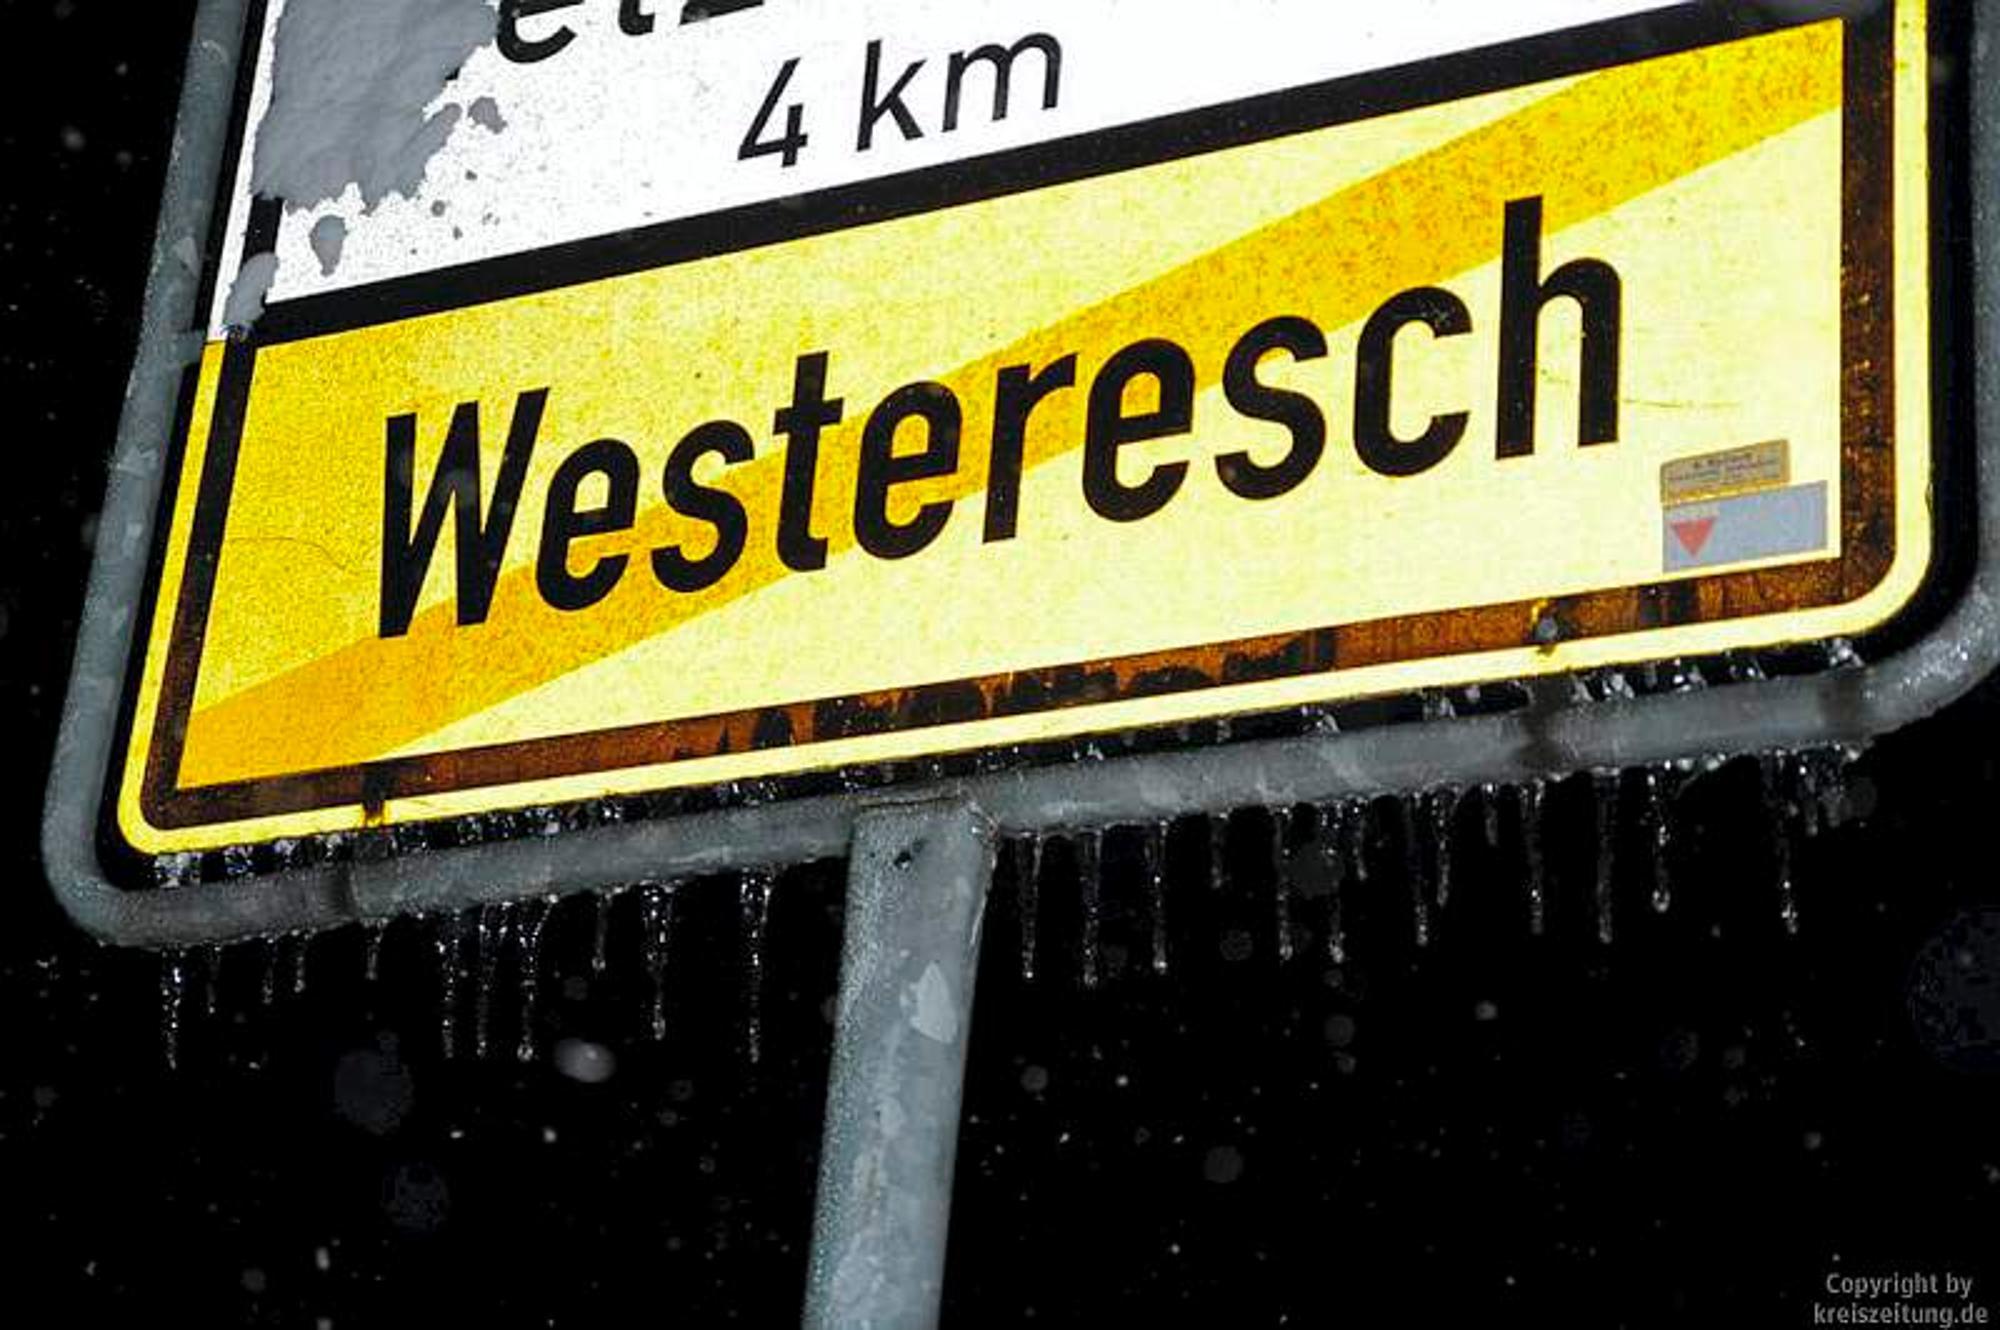 Kuhmühlen trotz schneeglätte revival im westerescher hof zieht gäste